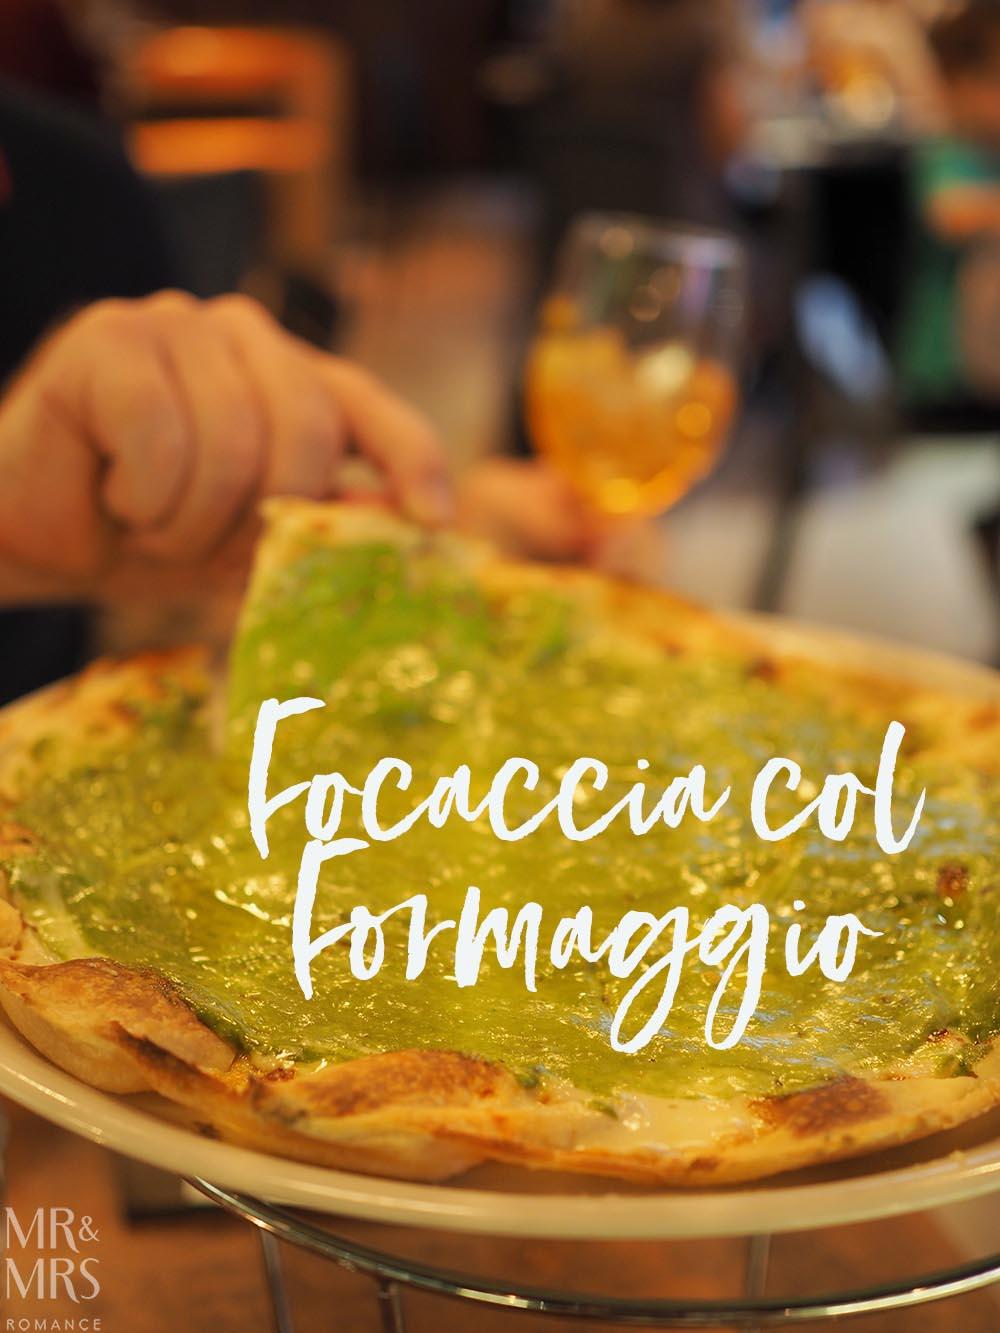 ReccoLab Rozelle - Sydney restaurant review - focaccia col formaggio